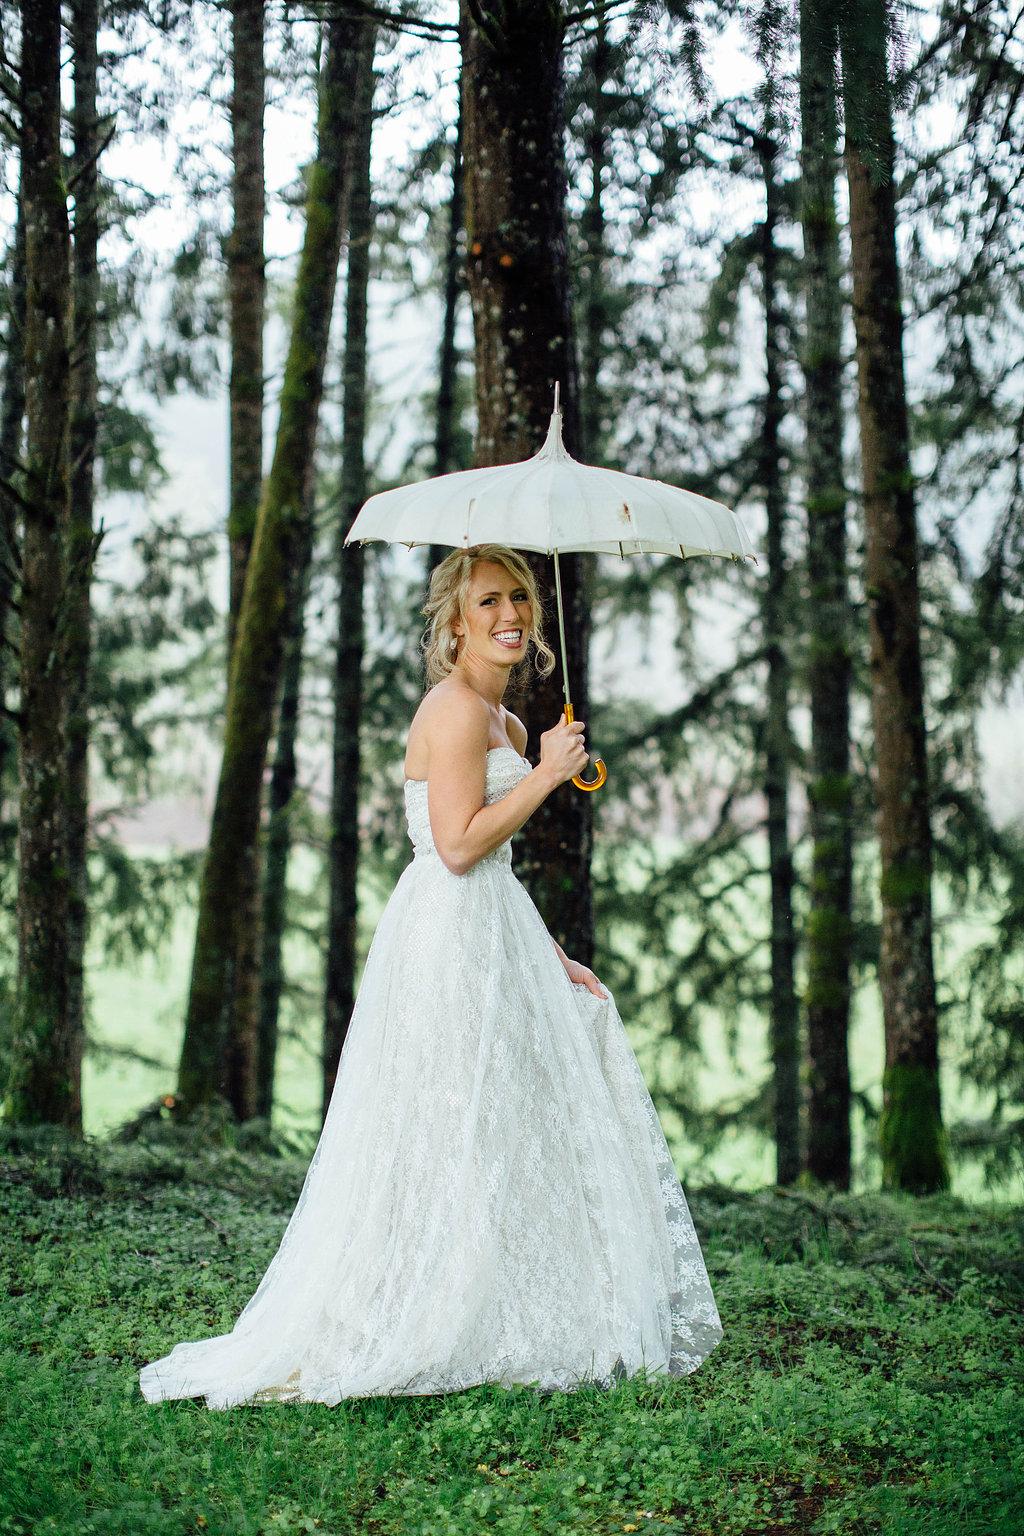 wedding dress in forest